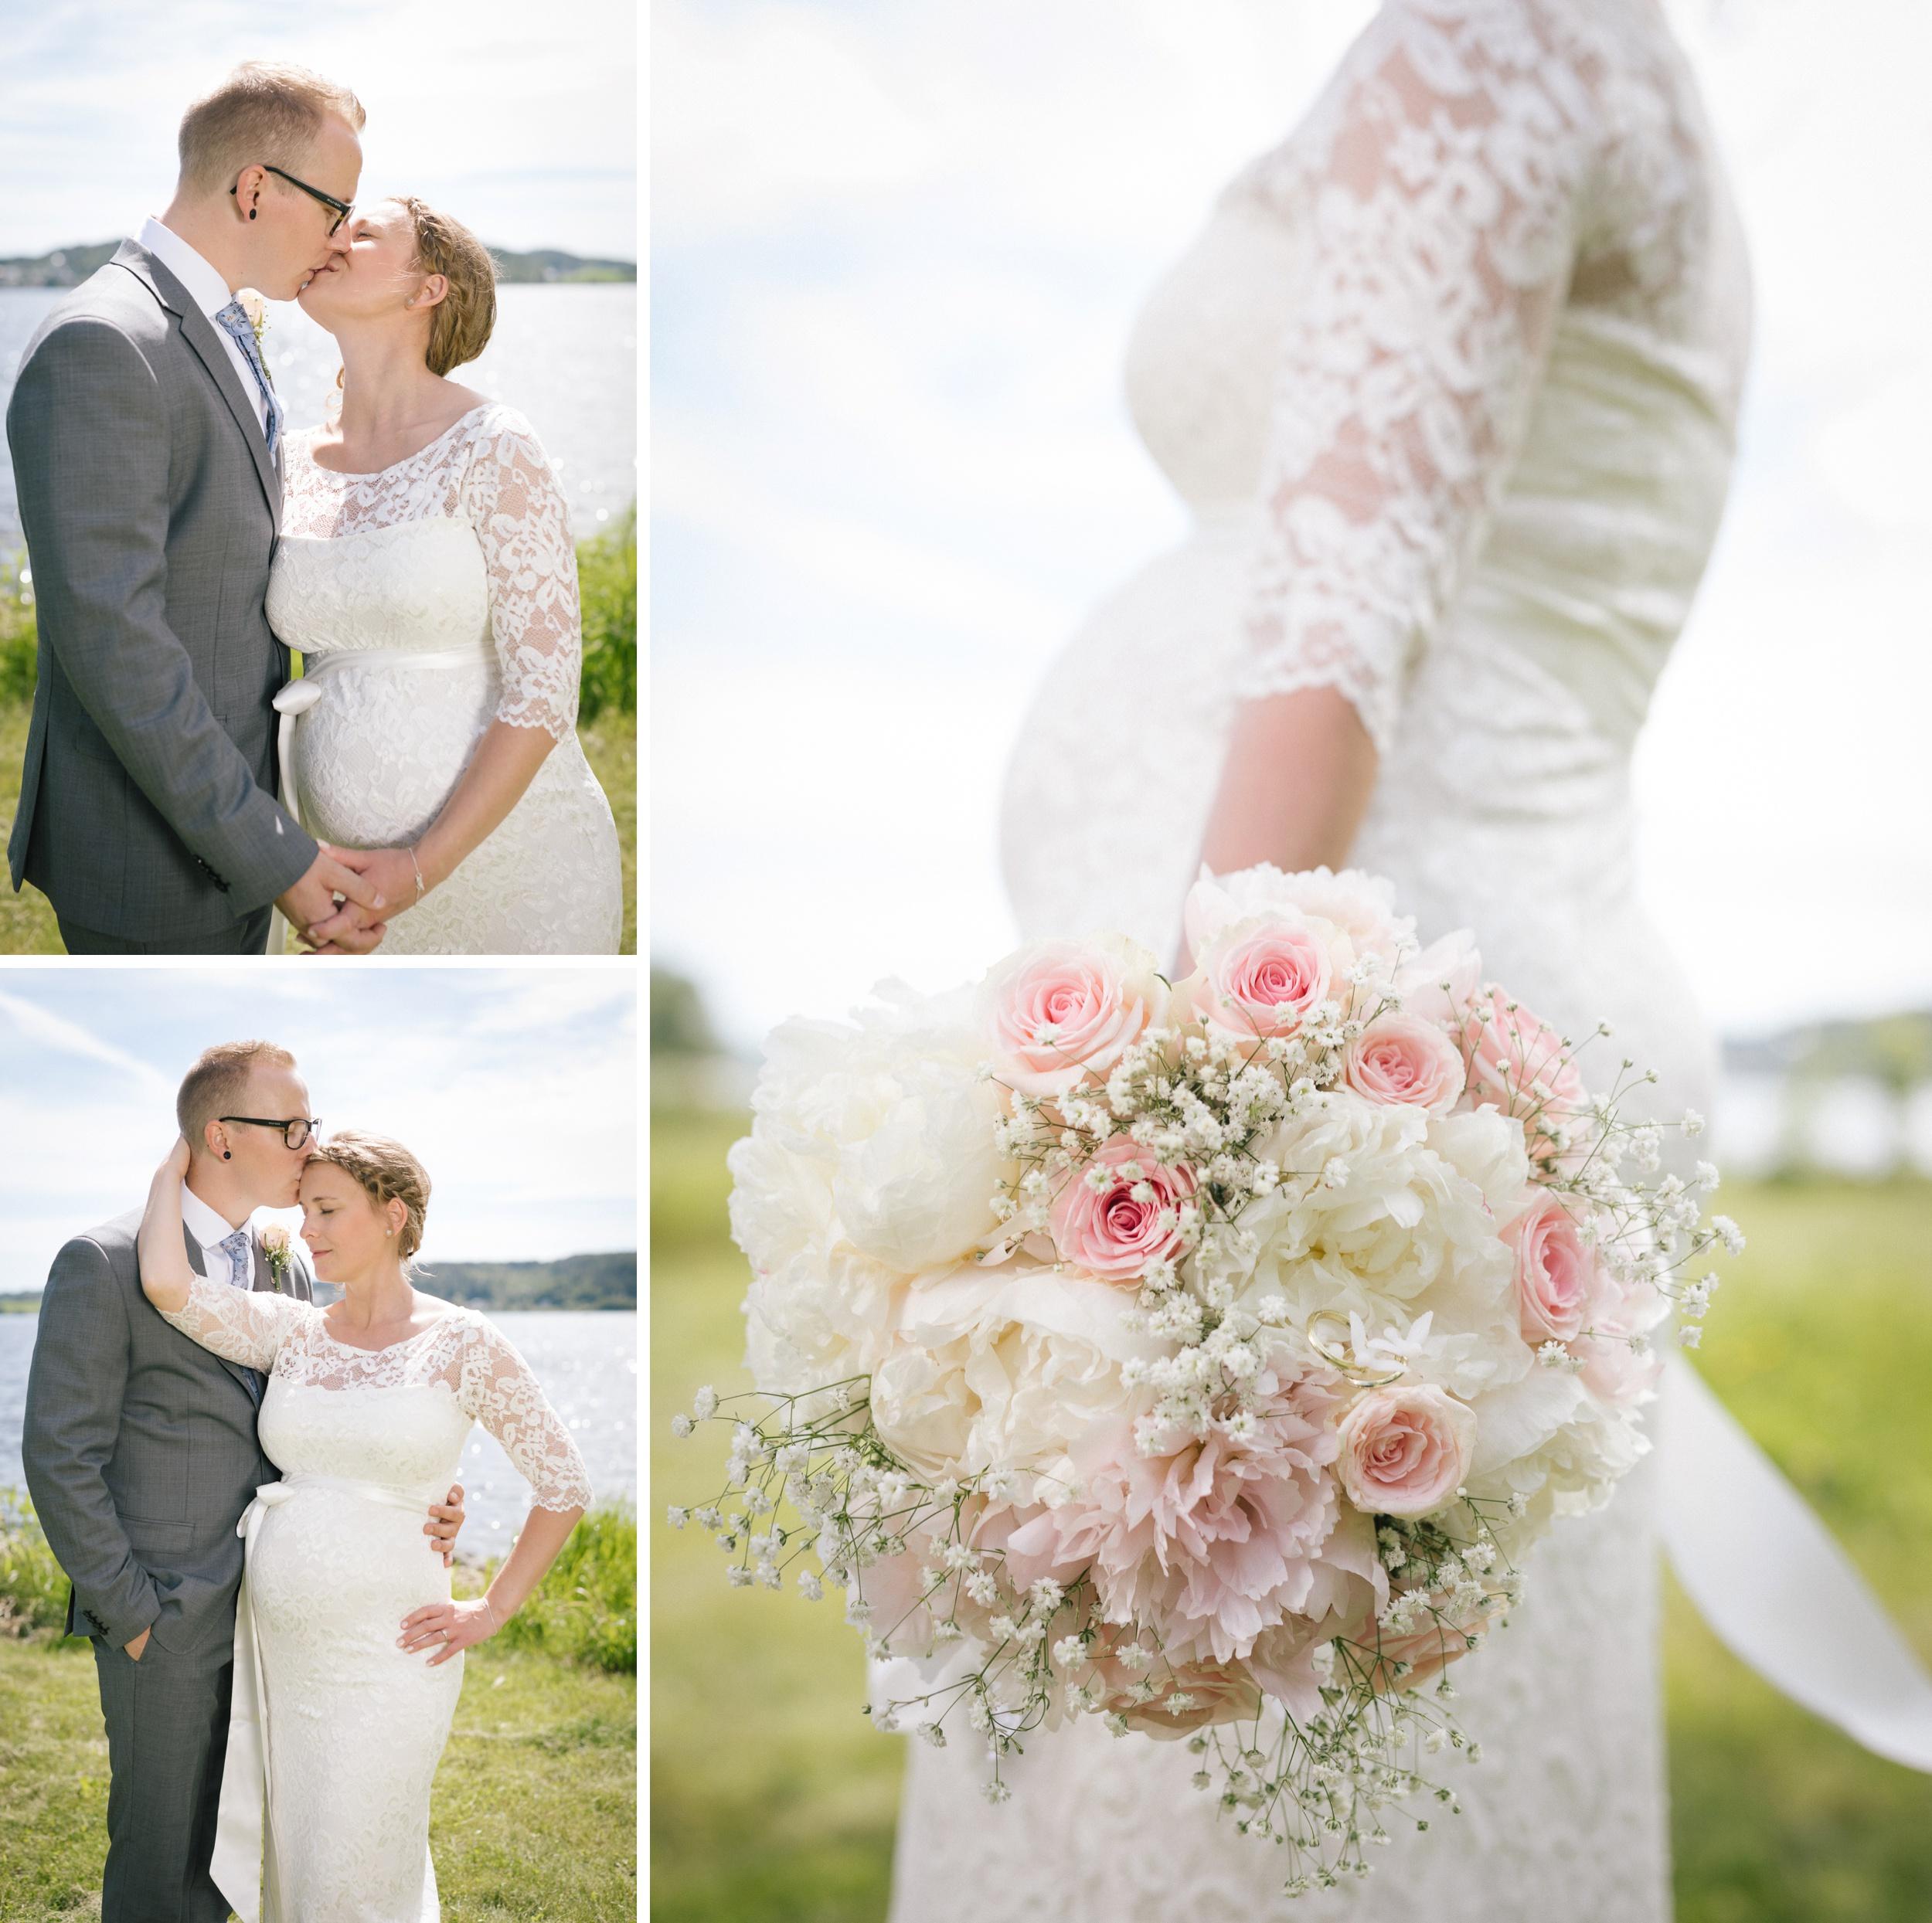 bryllup-bryllupsfotografering-bryllupsfotograf-sarpsborg-20170617-_H2A2615anneli_phillip_WEB.jpg